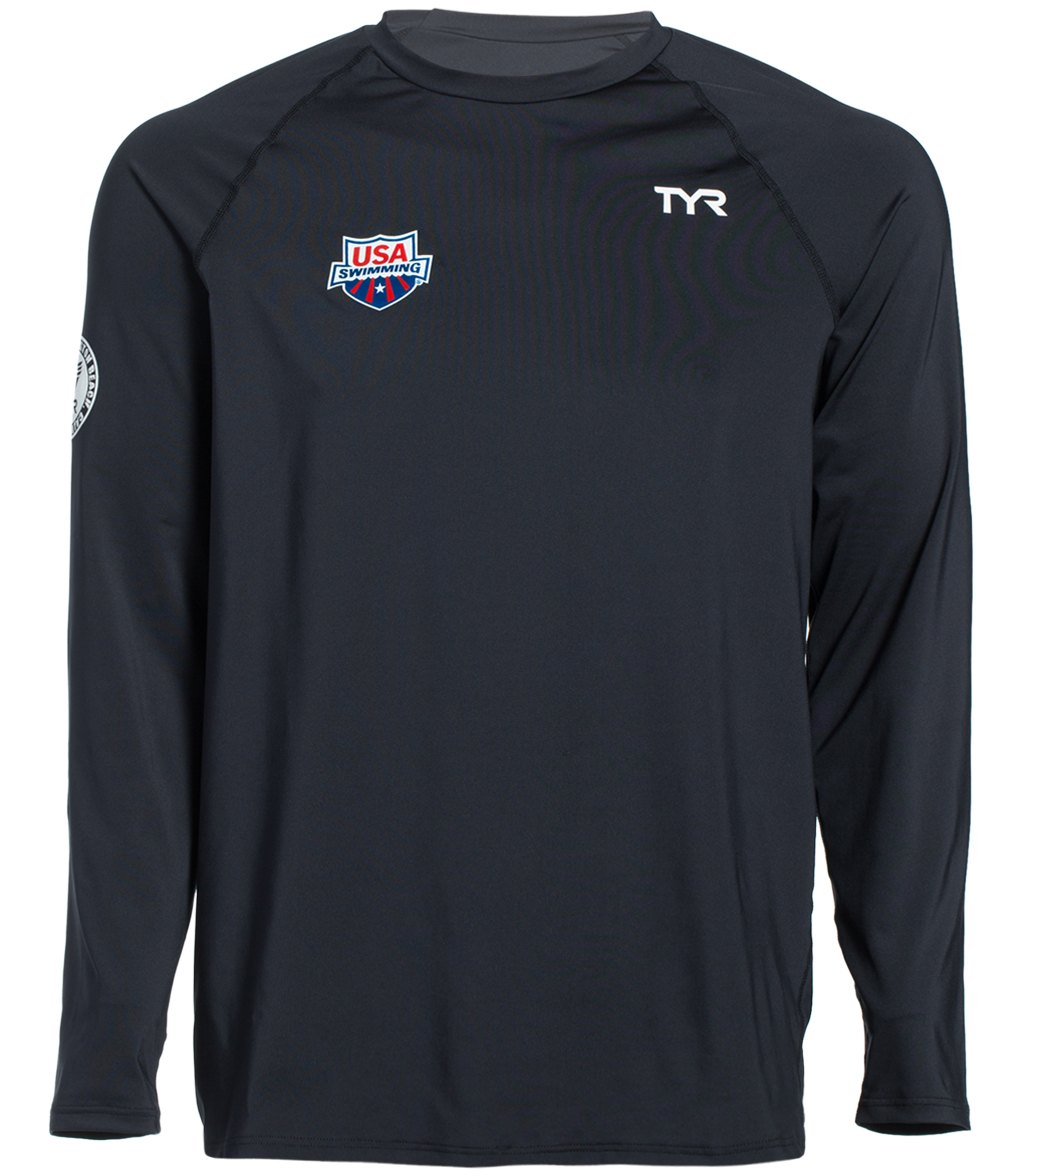 f2a7262149f7ed ... TYR USA Swimming Men s Long Sleeve Swim Shirt. Play Video. Play Video